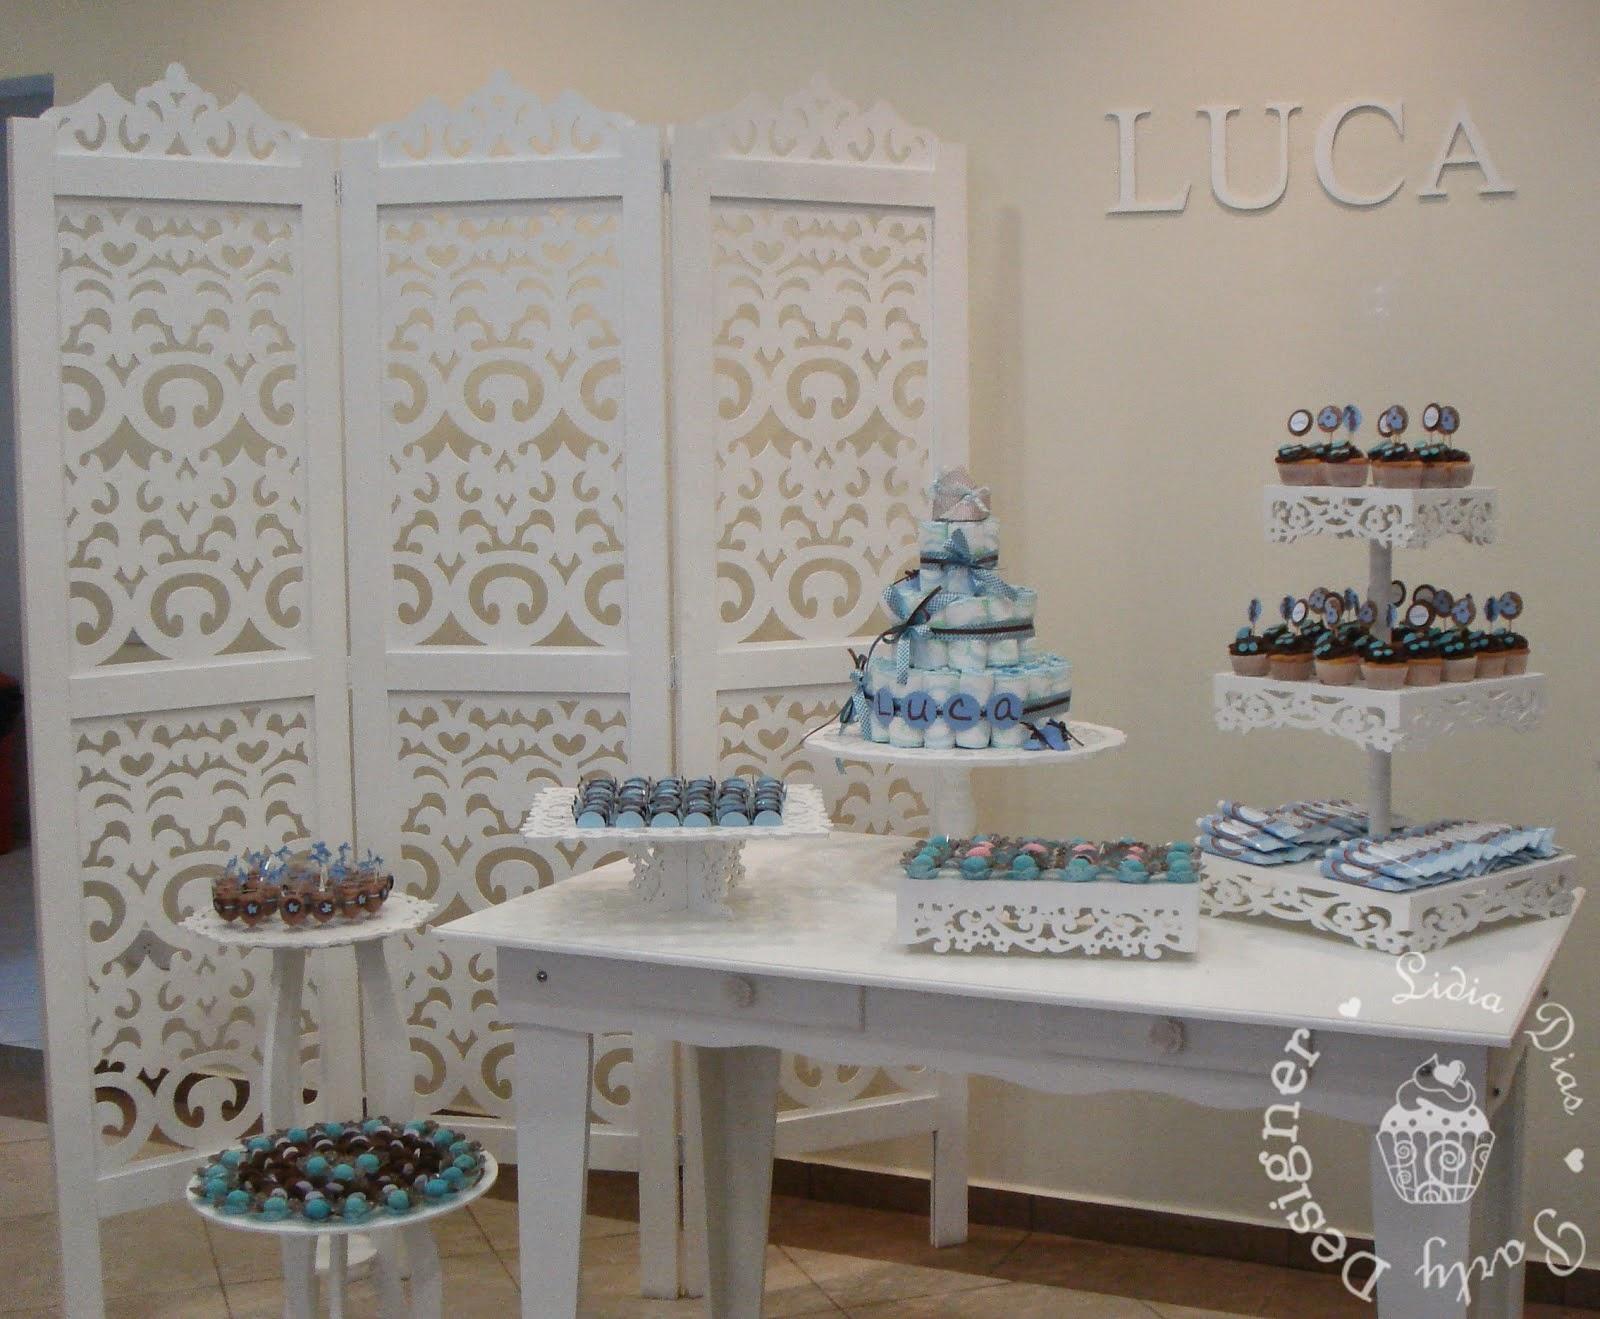 Chá de Fraldas - Luca